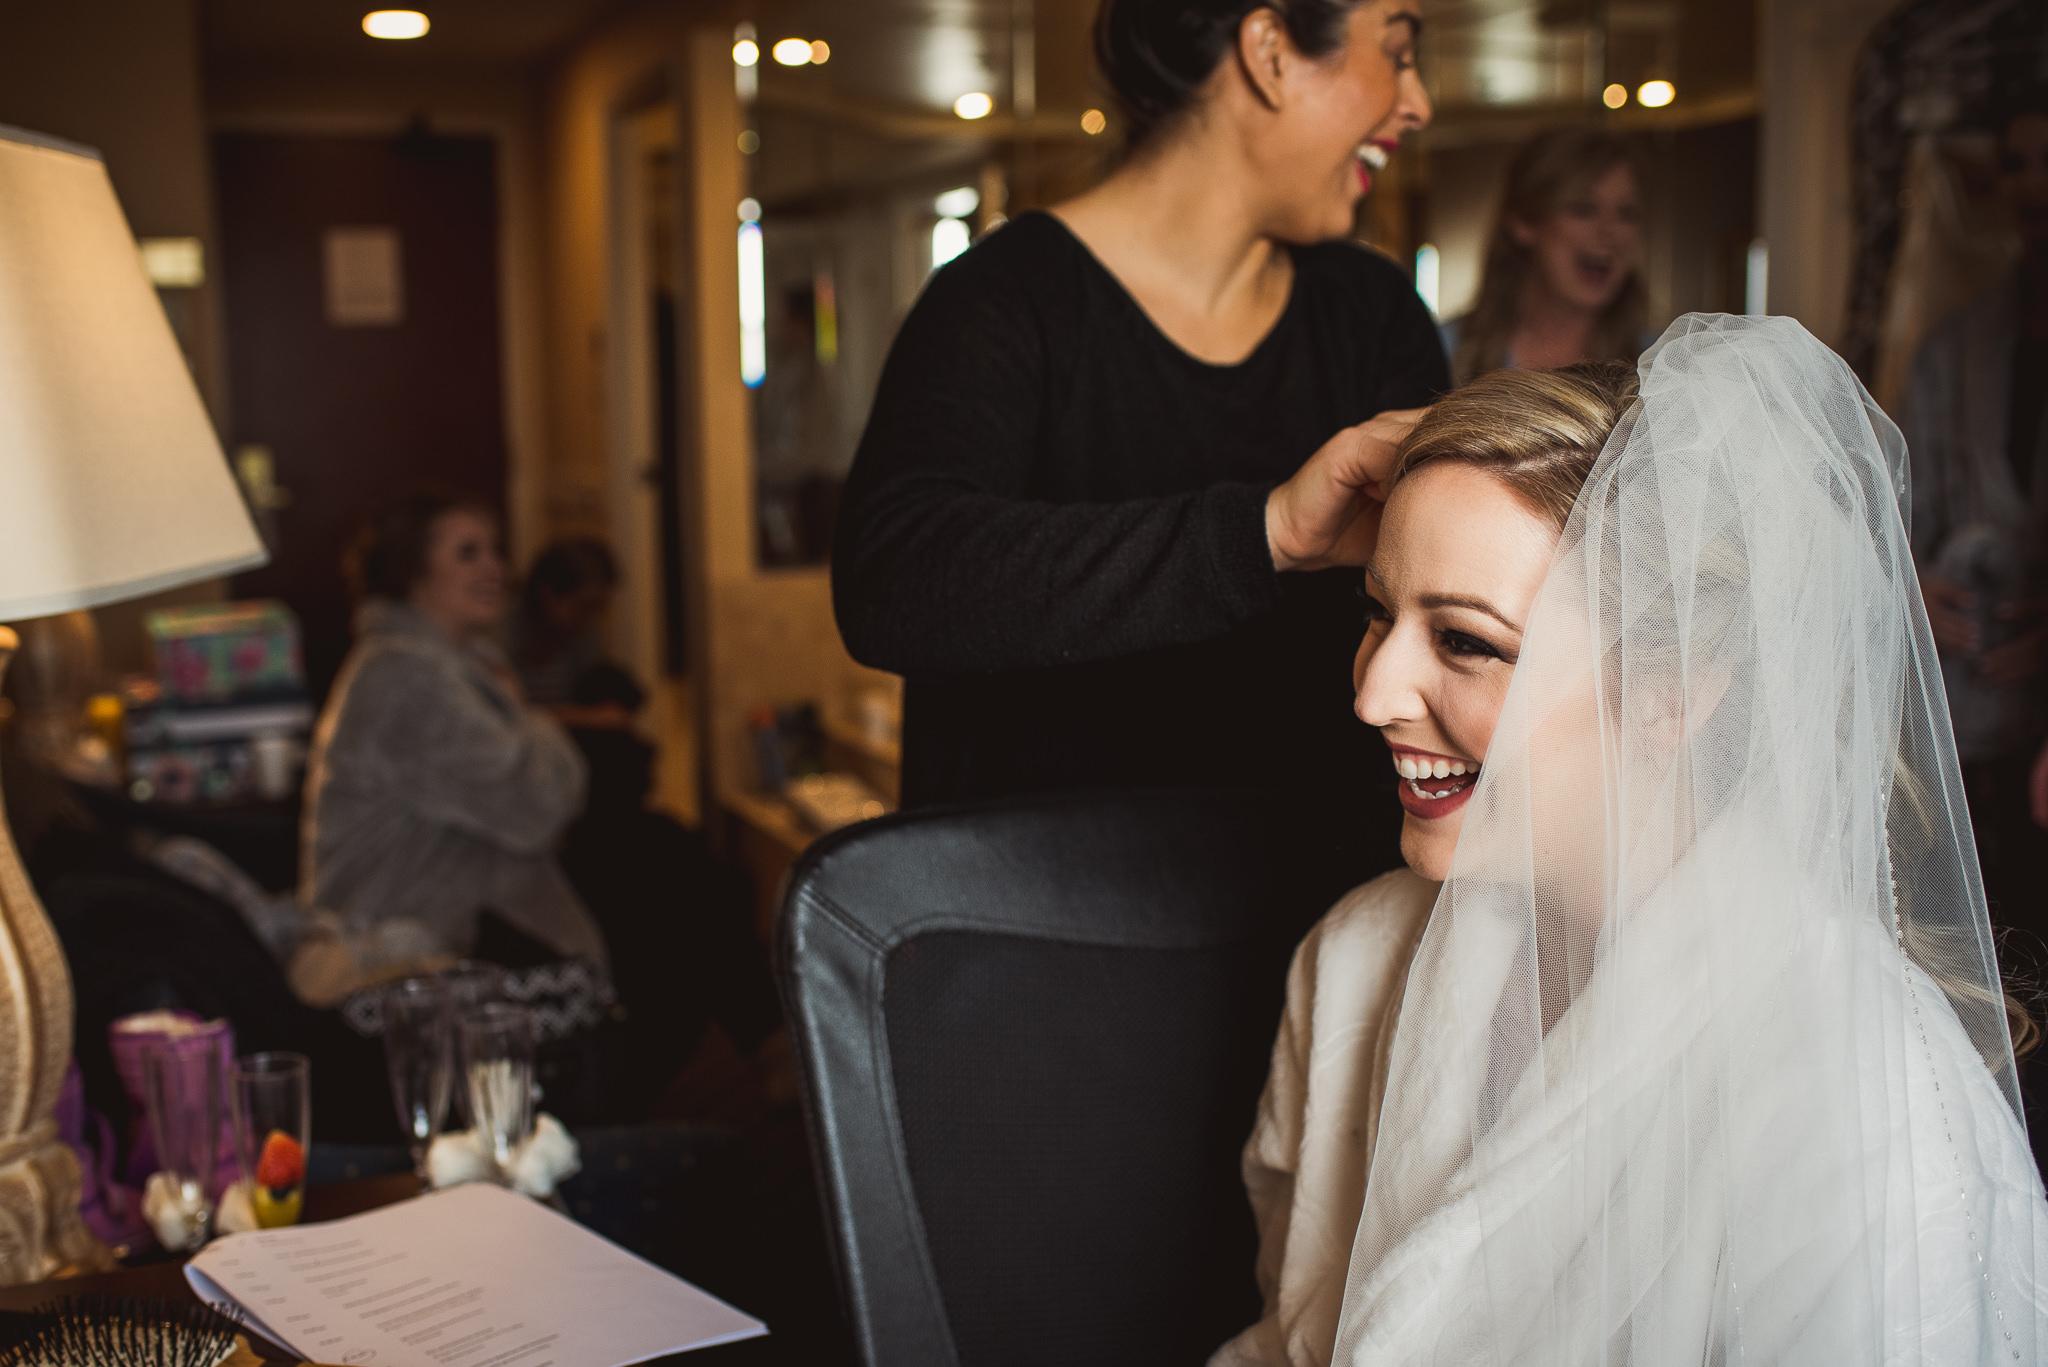 kortright center winter wedding photos 50 - Kortright Center Winter Wedding Photos